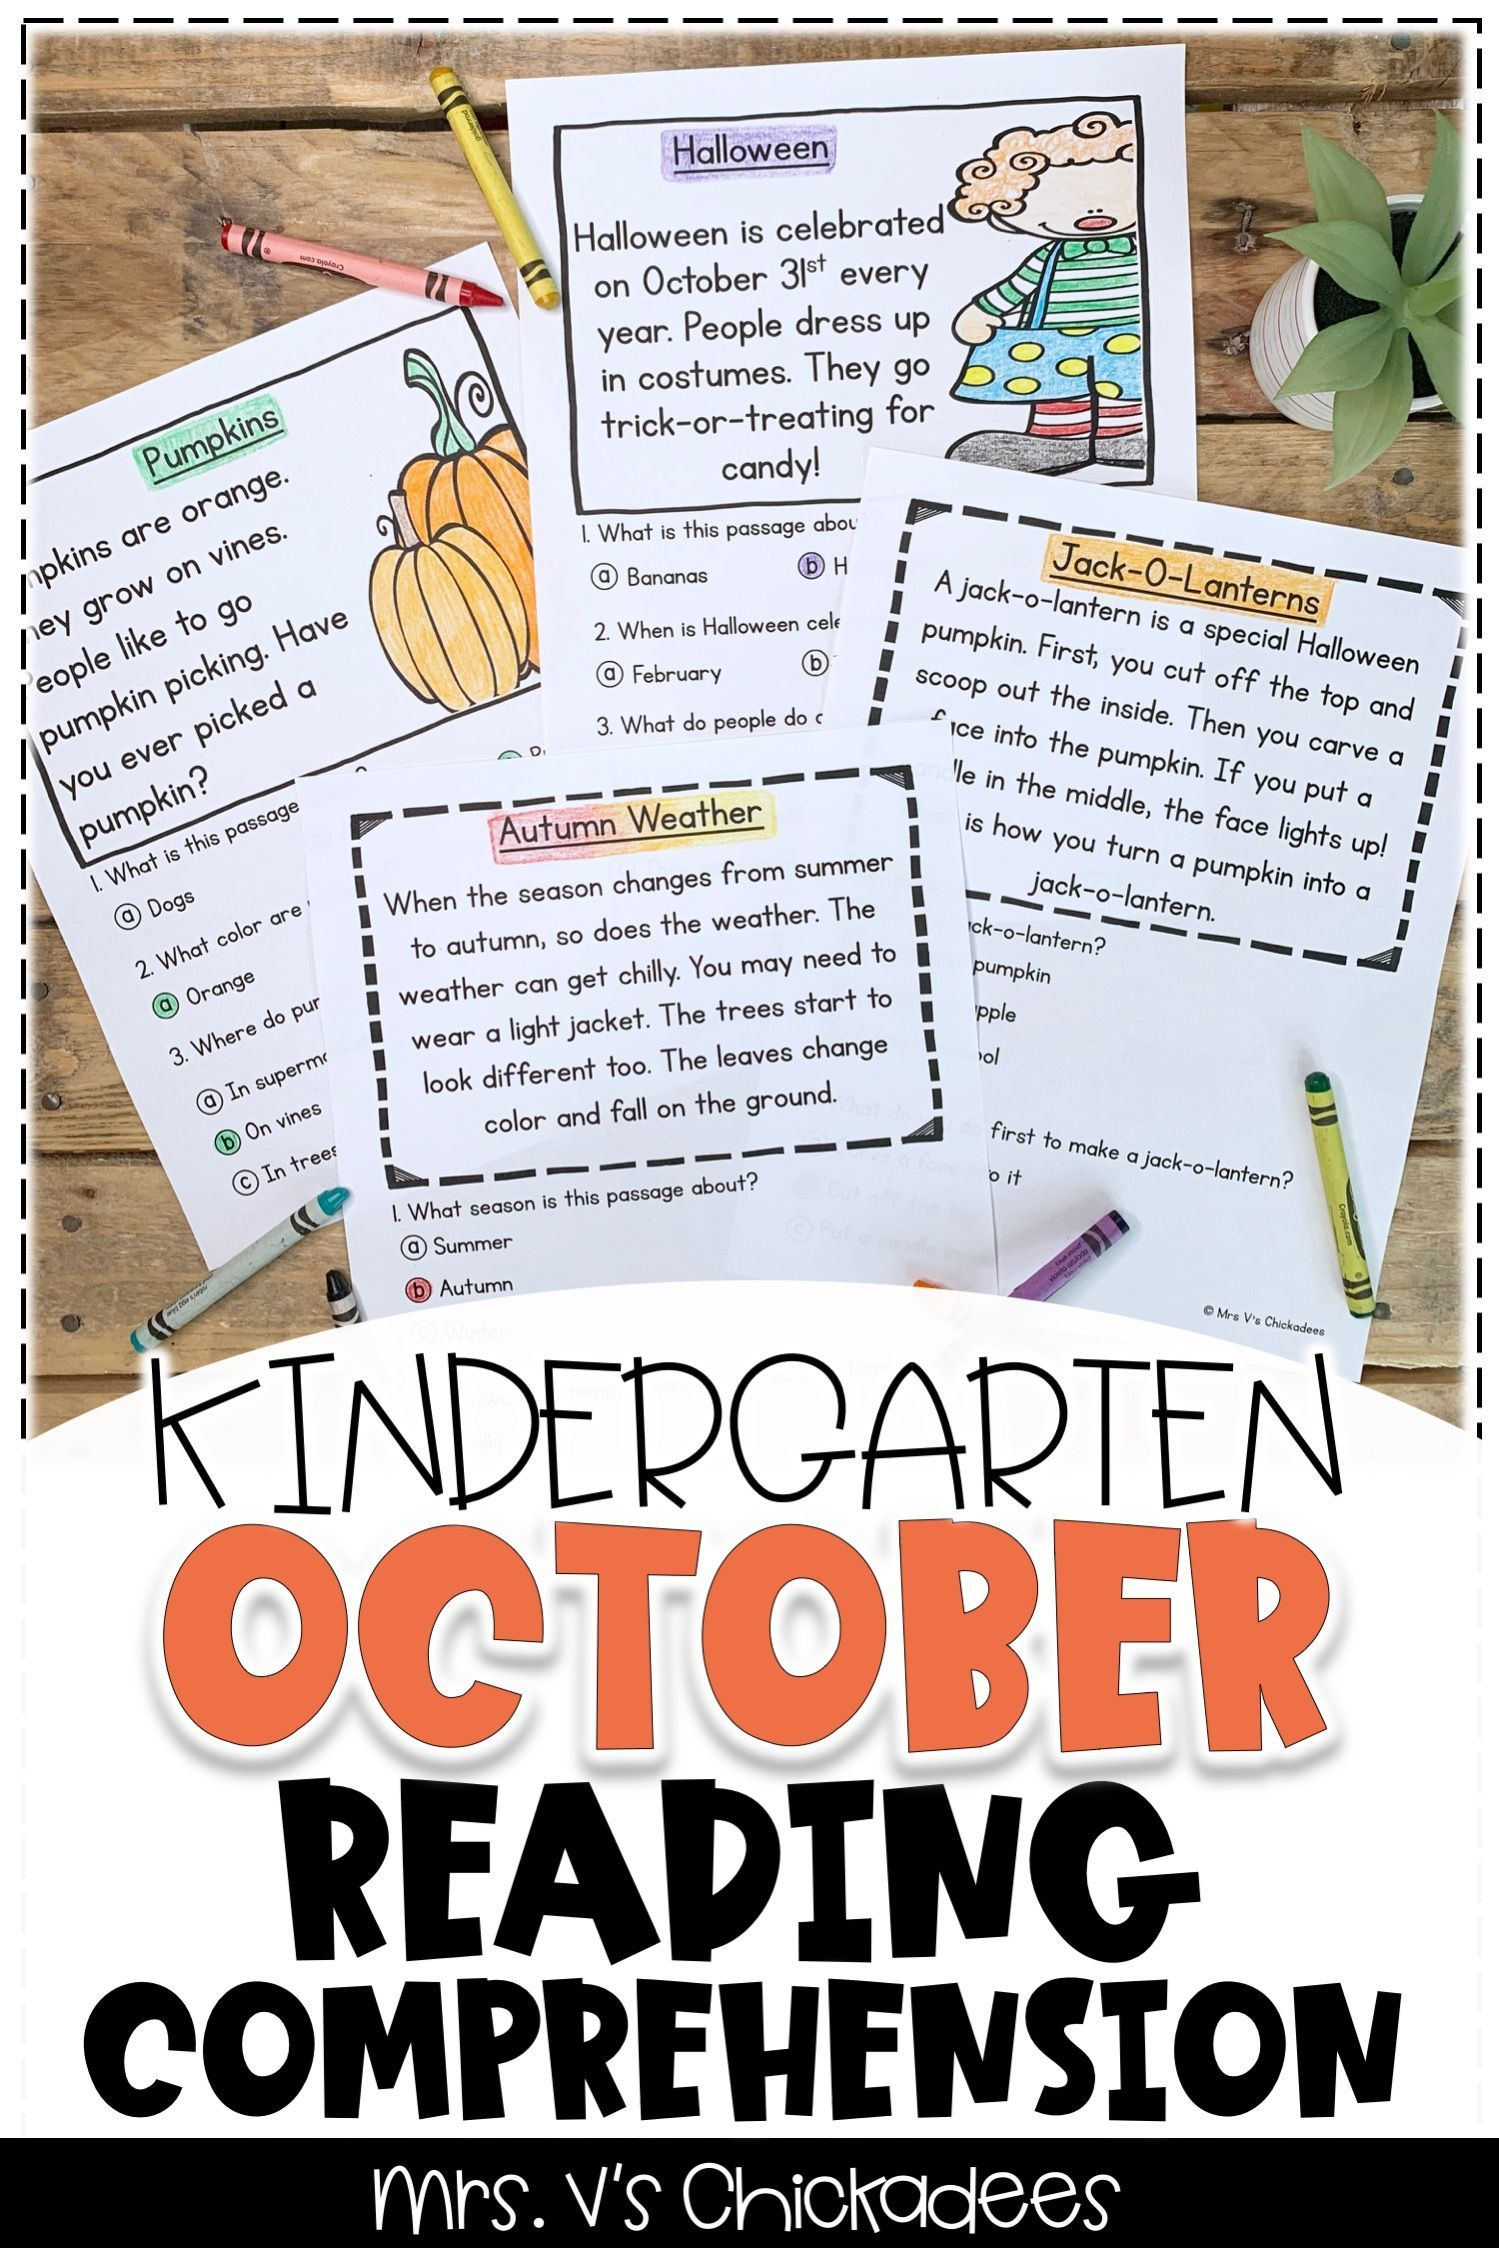 Reading Comprehension Passages Questions October Edition Reading Comprehension Passages Comprehension Passage Reading Comprehension Kindergarten [ 2249 x 1499 Pixel ]